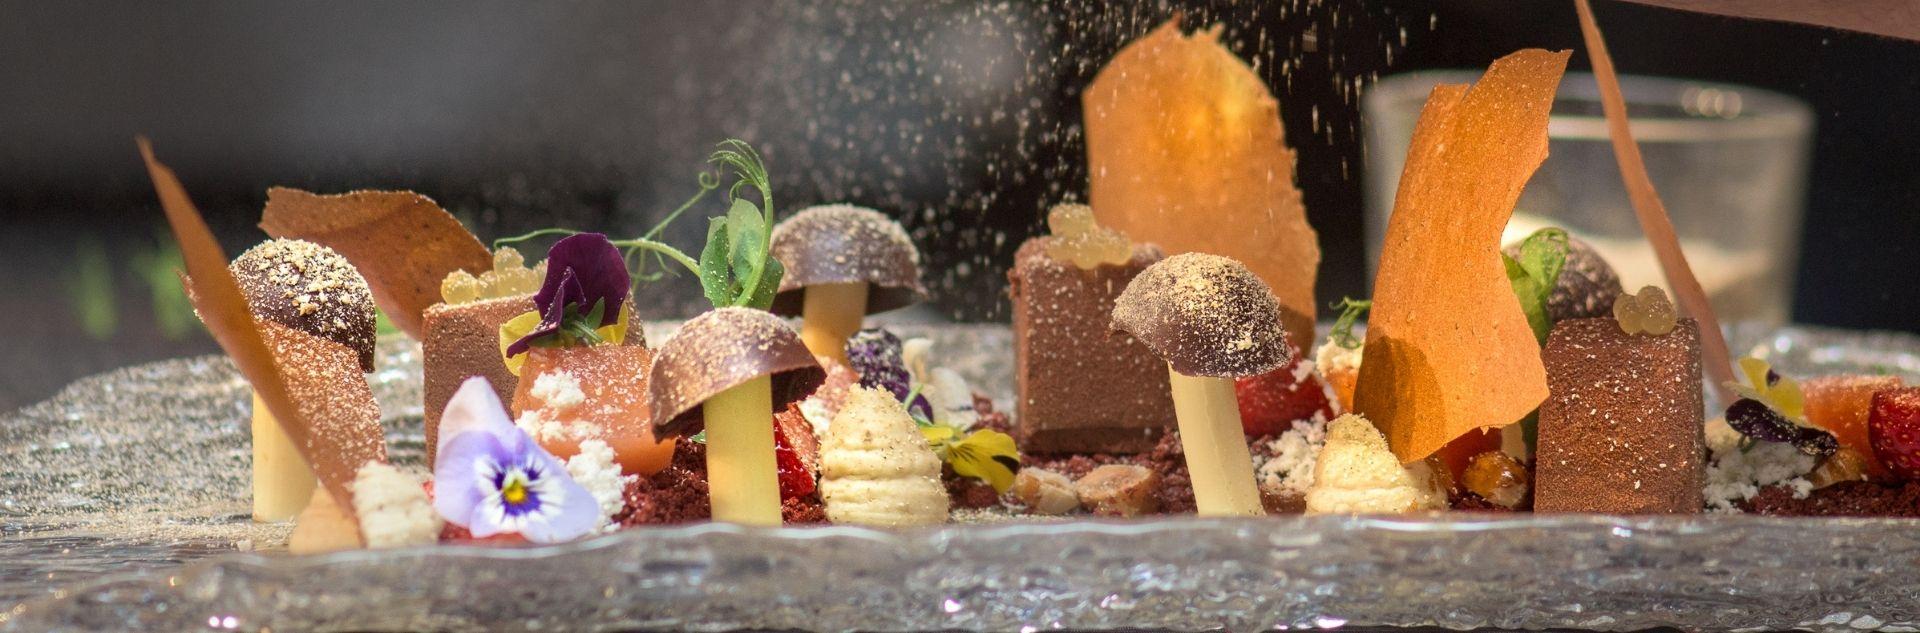 Süße Spezialitäten aus Europa